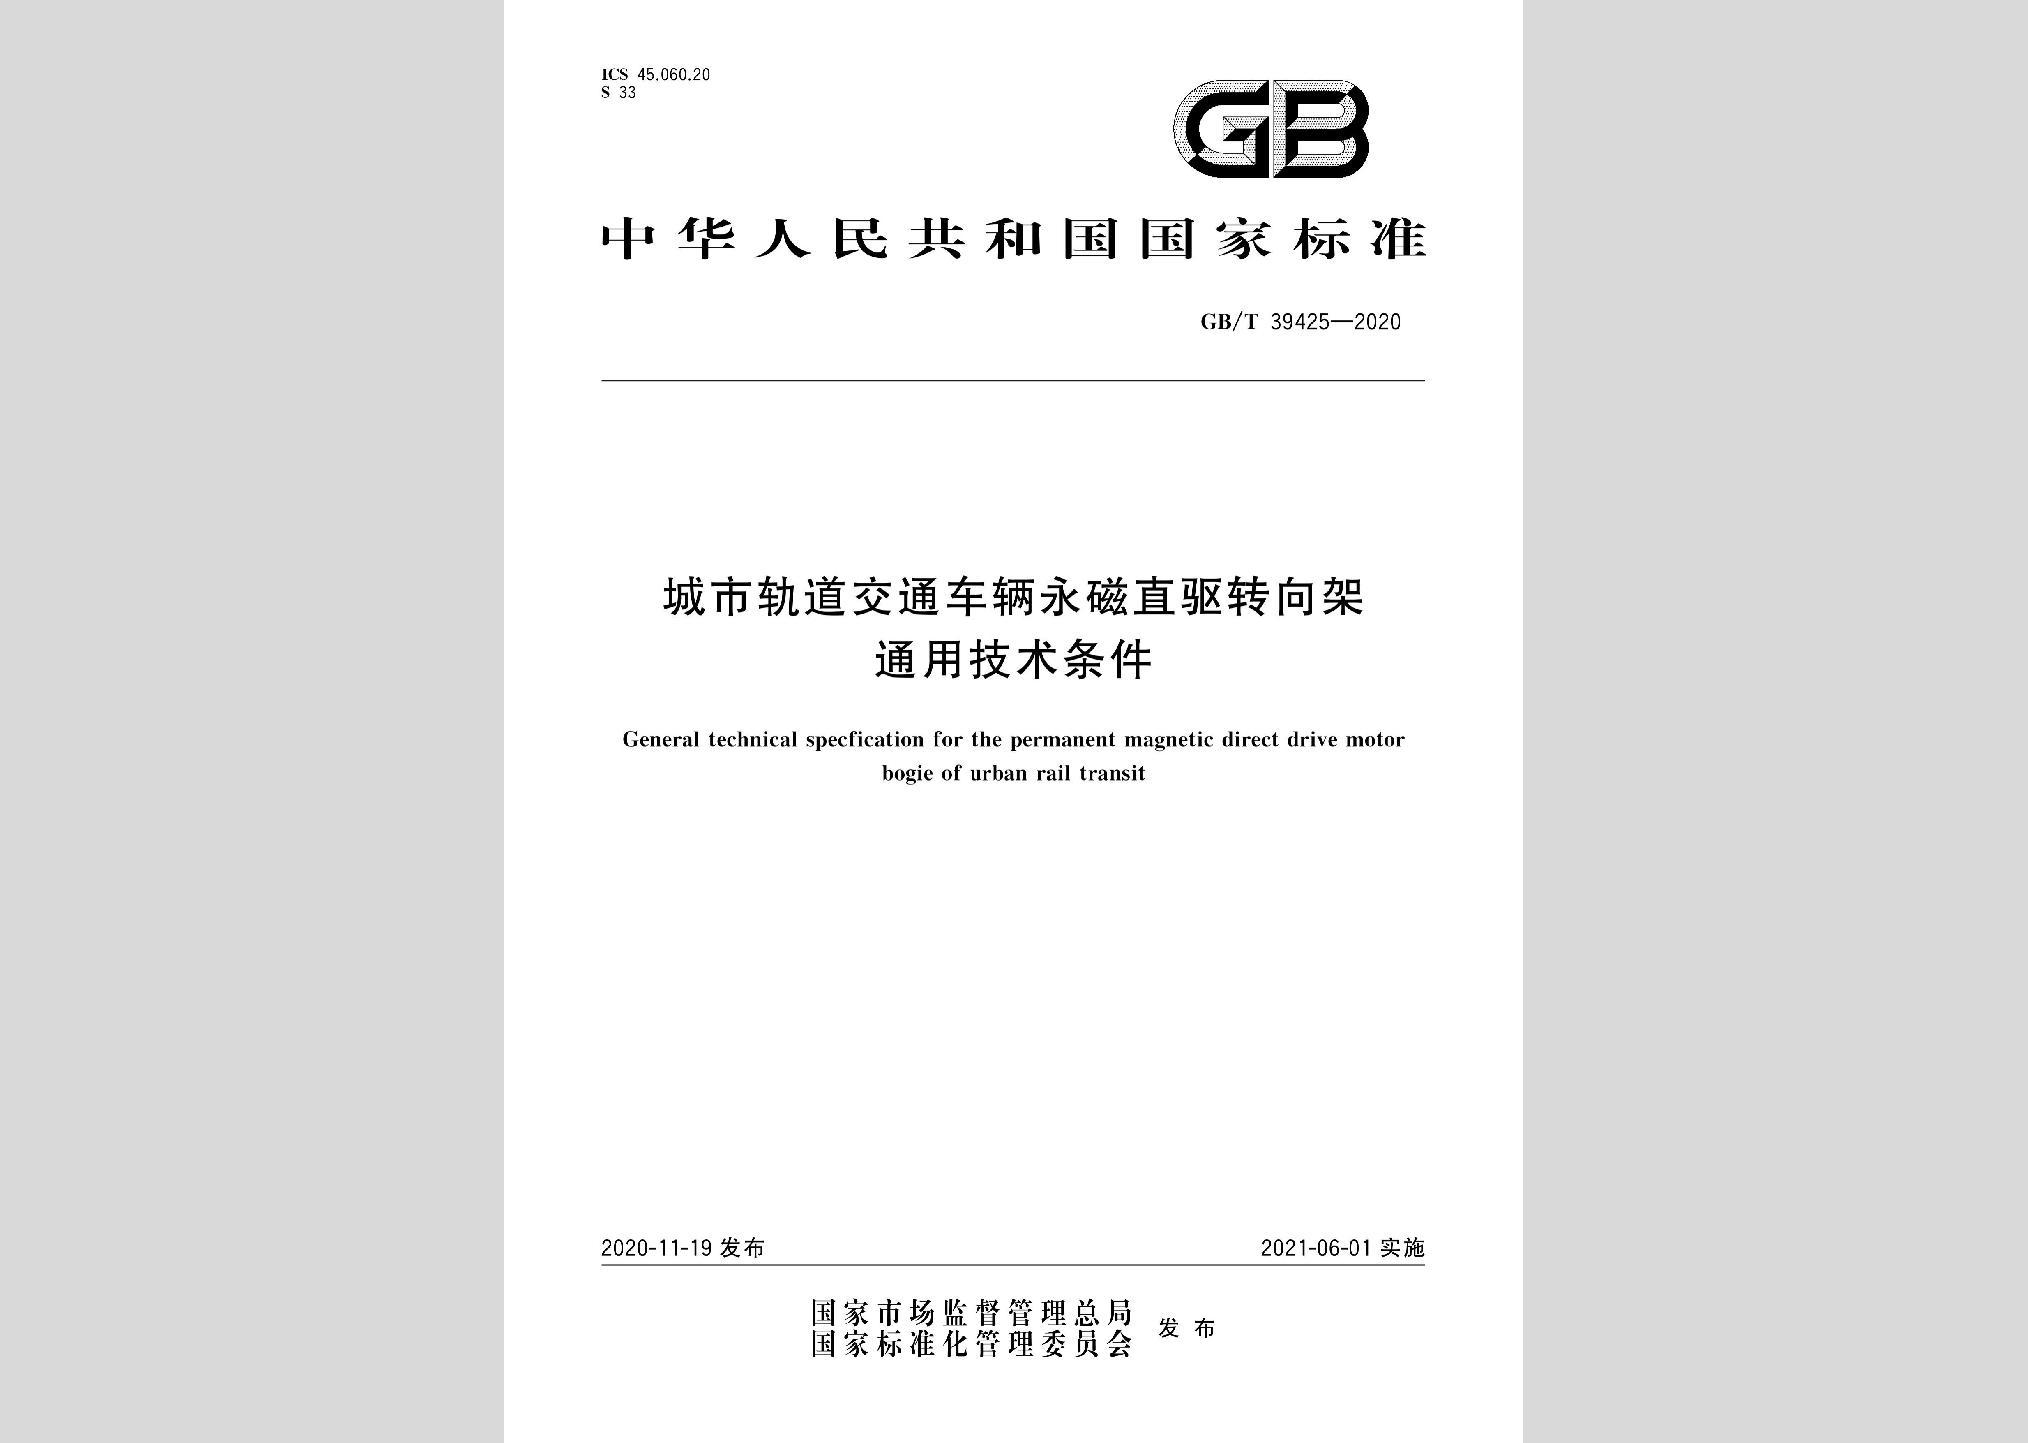 GB/T39425-2020:城市轨道交通车辆永磁直驱转向架通用技术条件